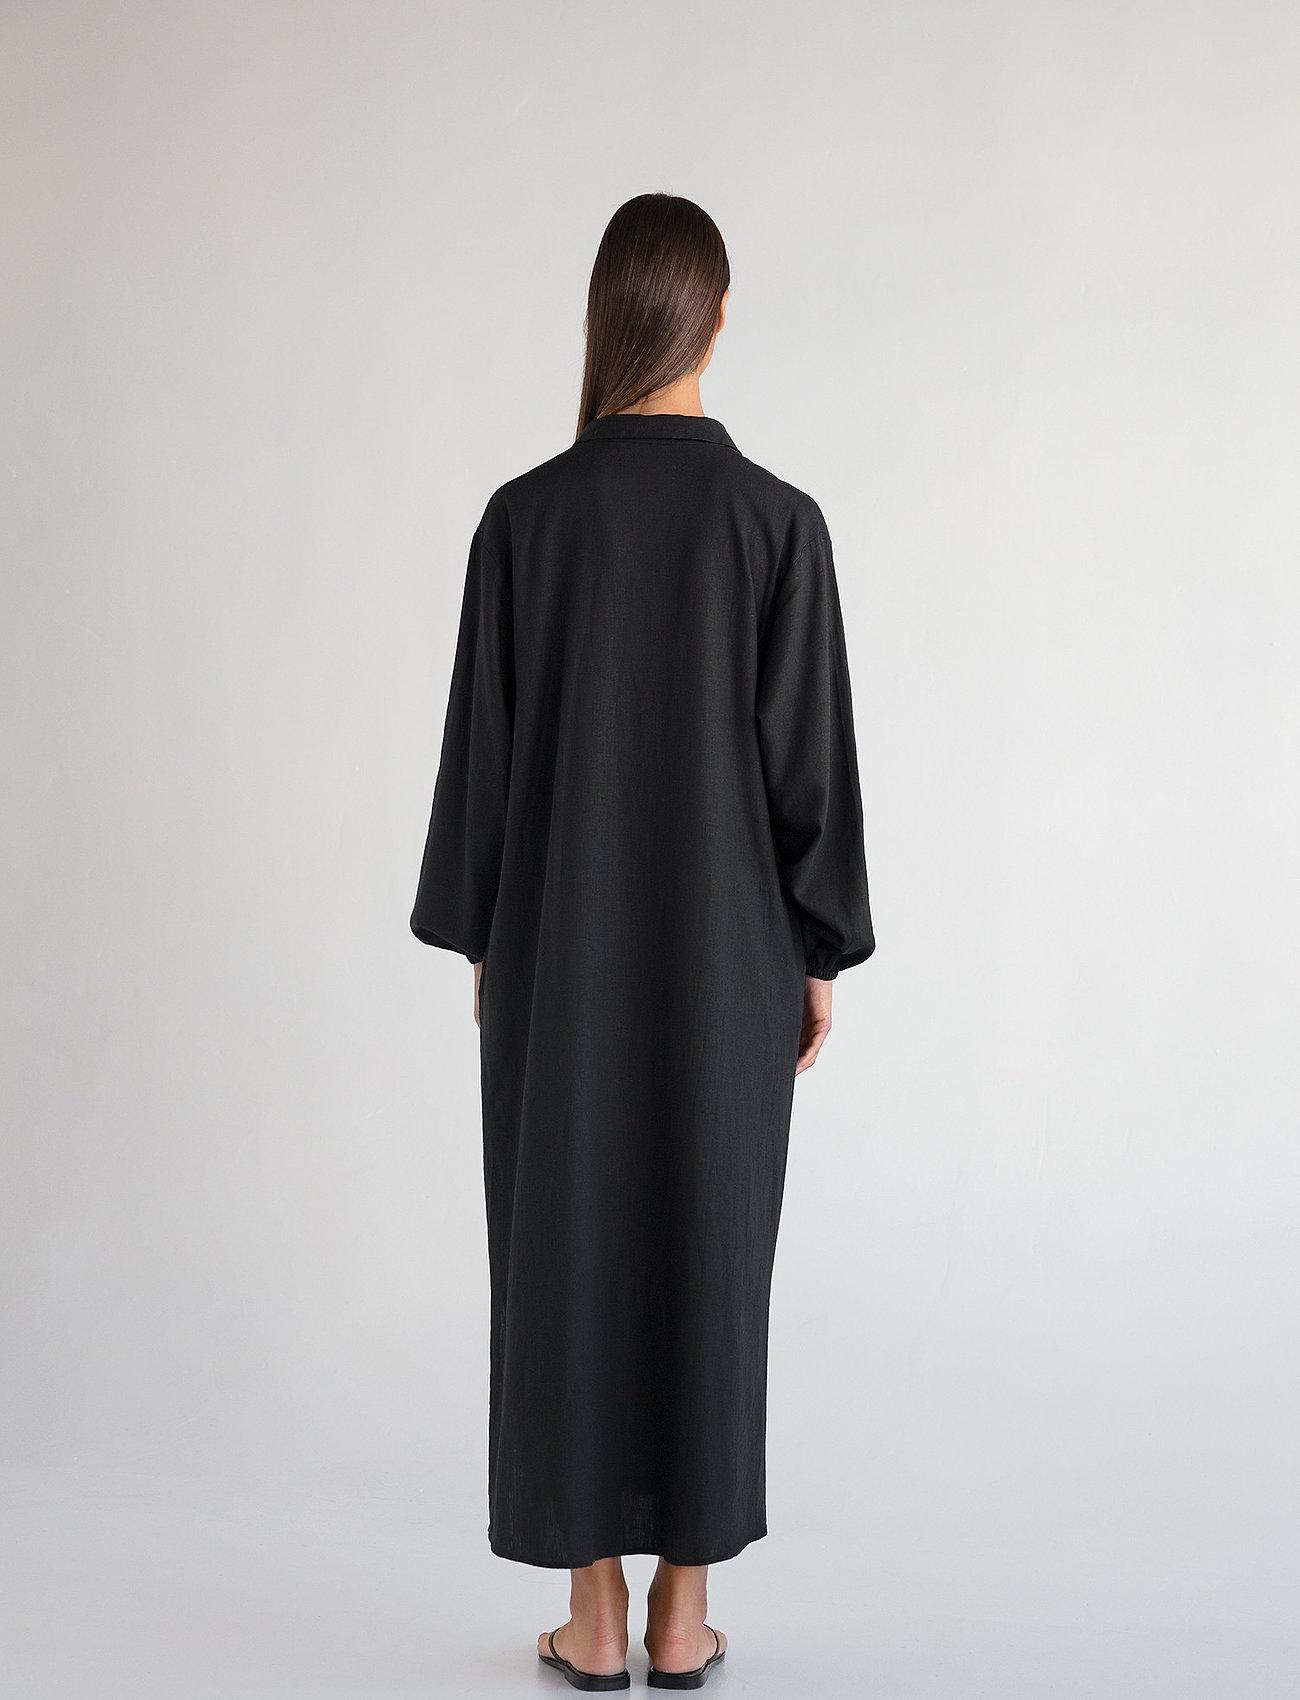 Stylein - SOUAL - maxi dresses - black - 3